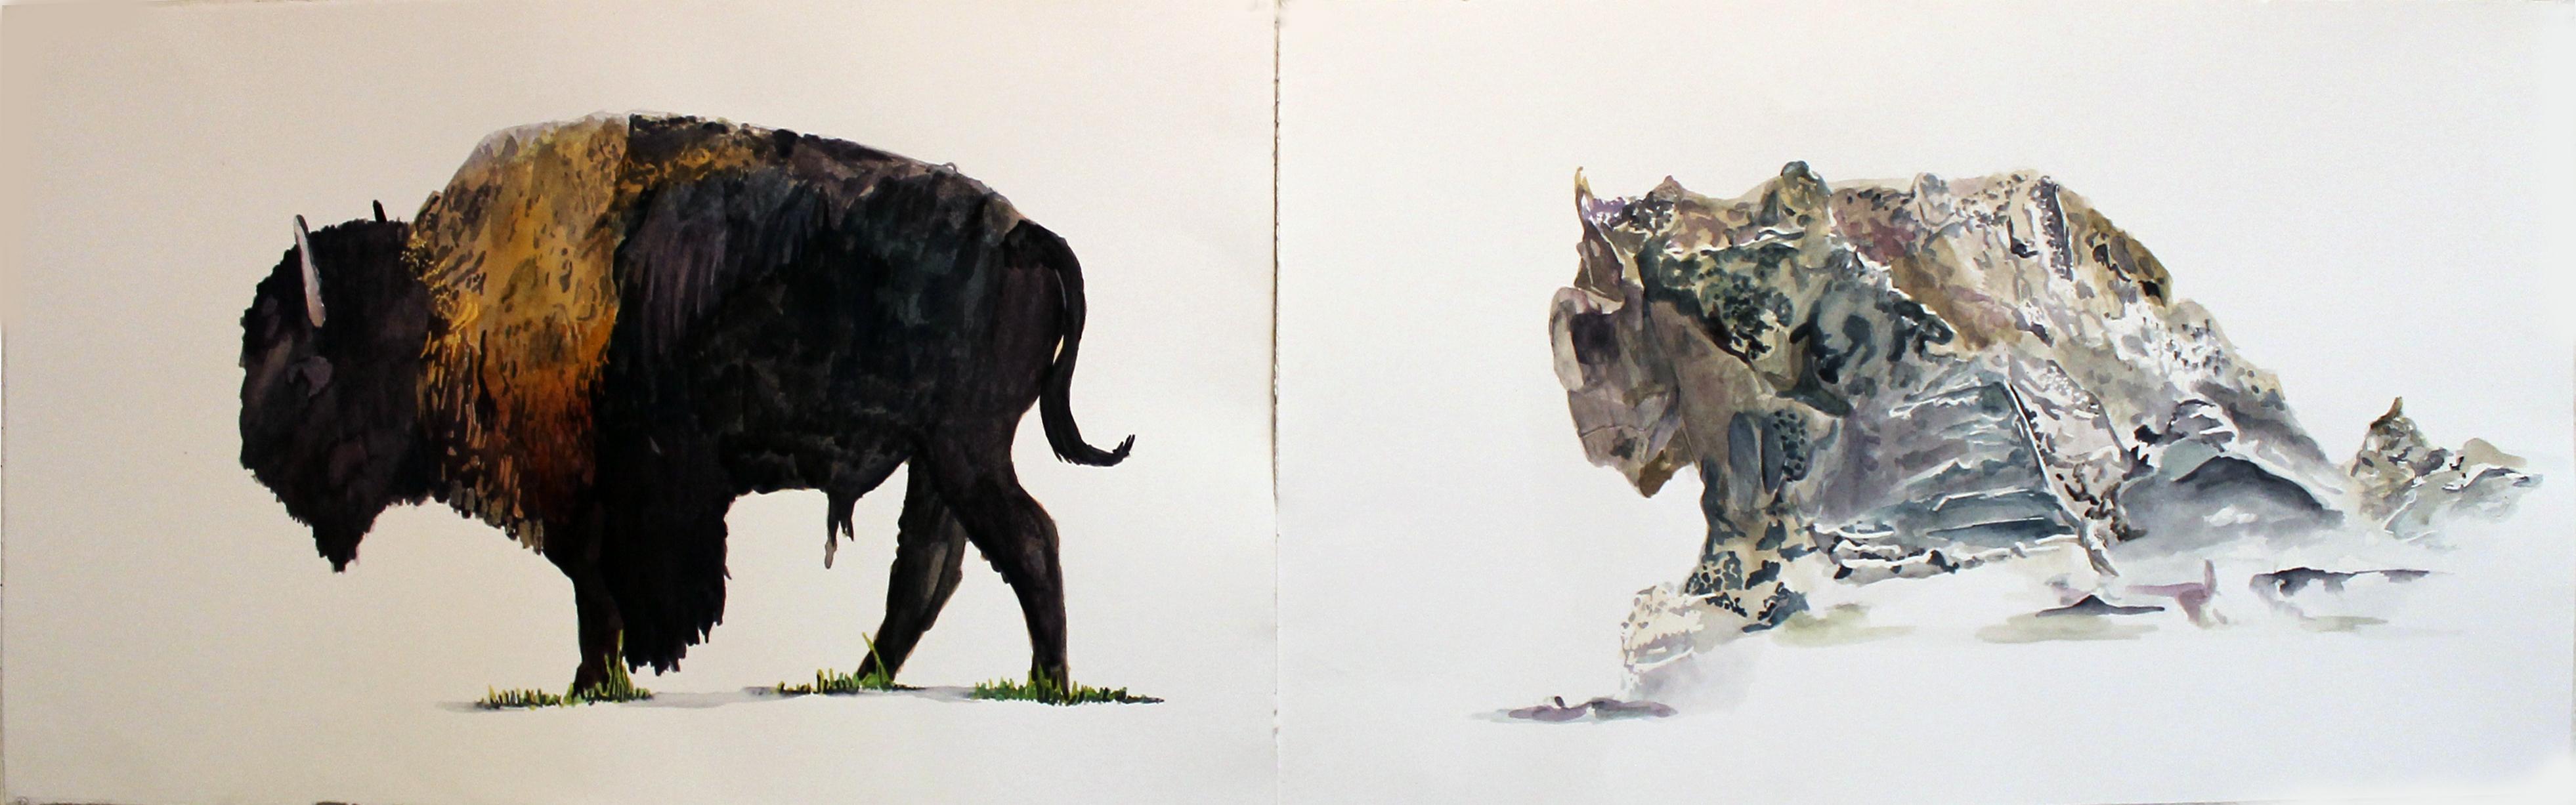 buffalo rock1